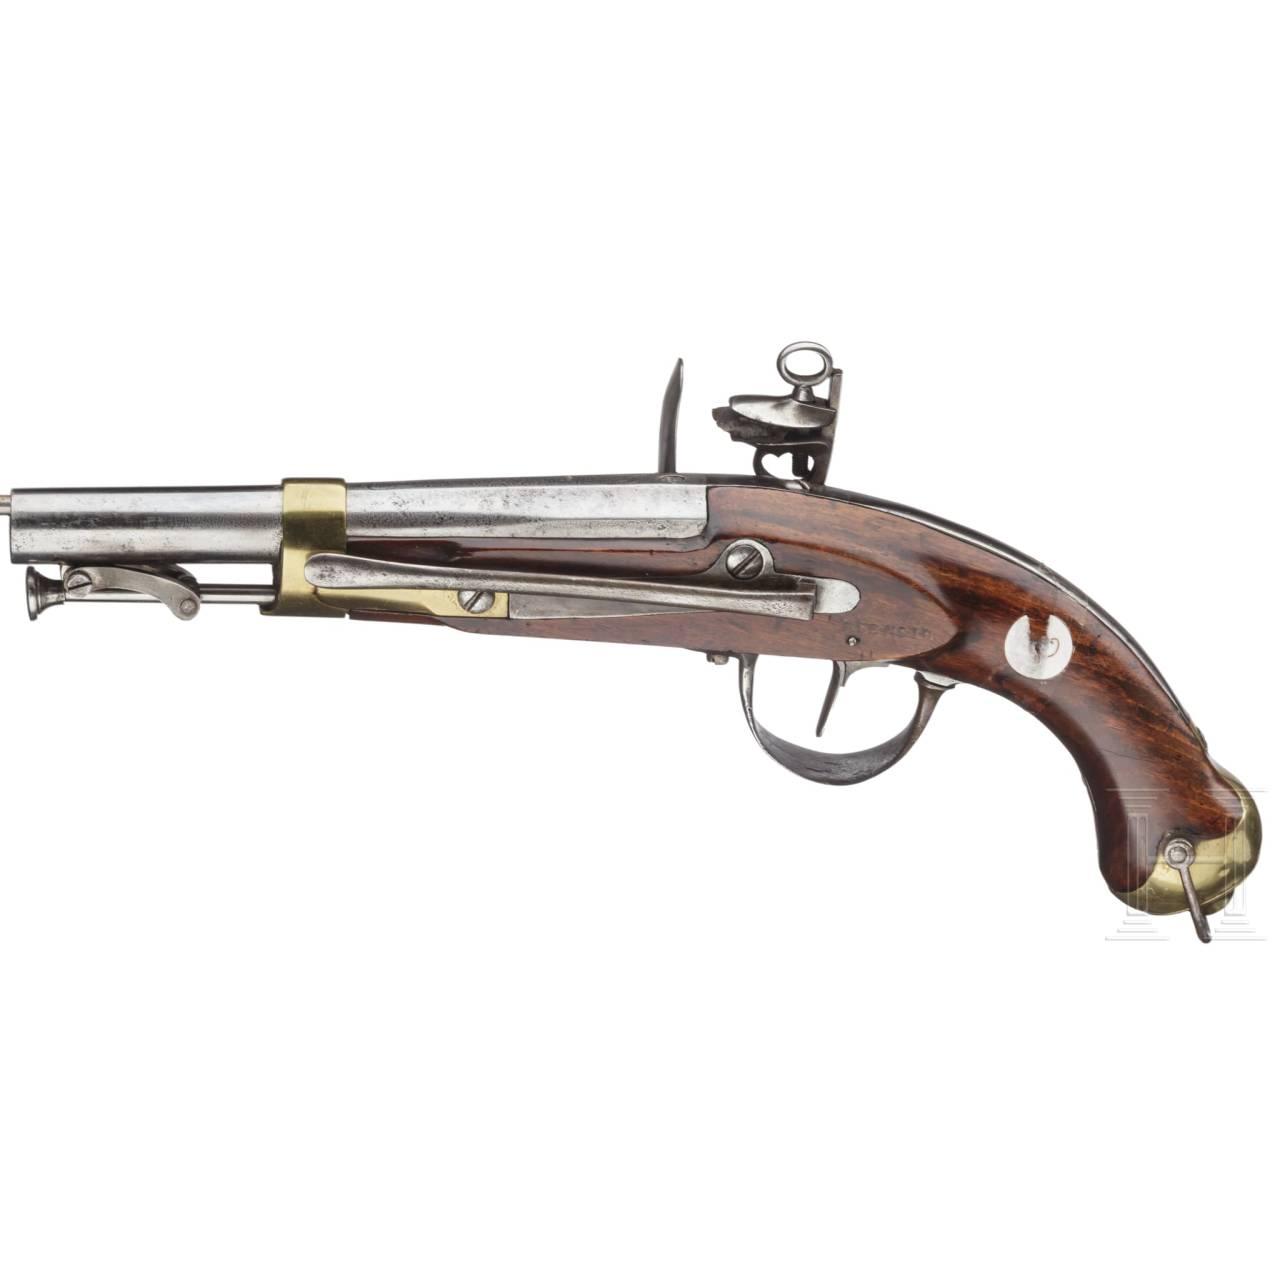 A Spanish flintlockpistol, Guardia Real Modelo 1824